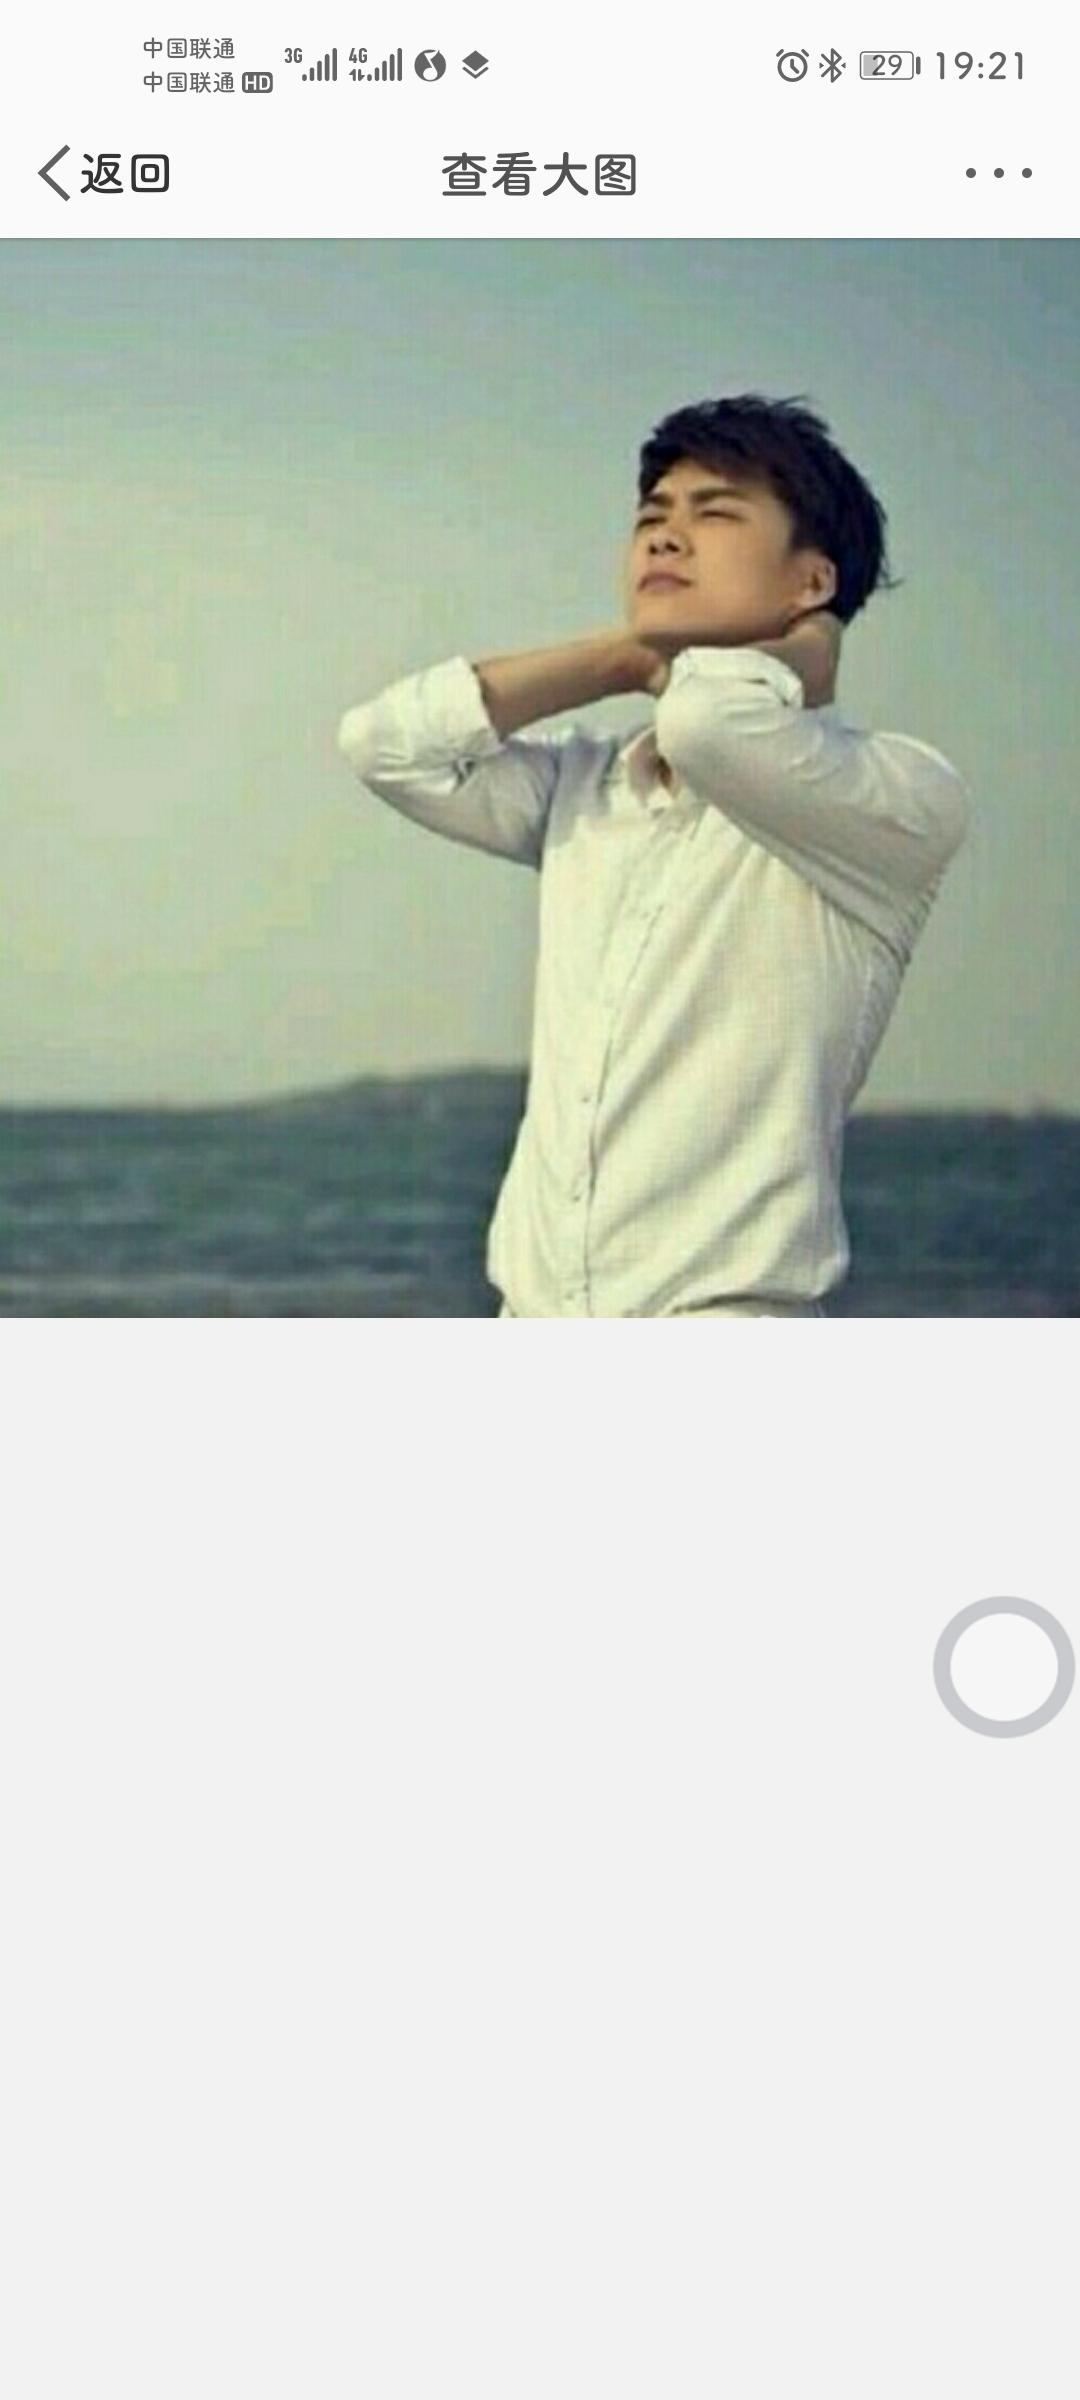 Screenshot_20210408_192200_com.sina.weibo.jpg